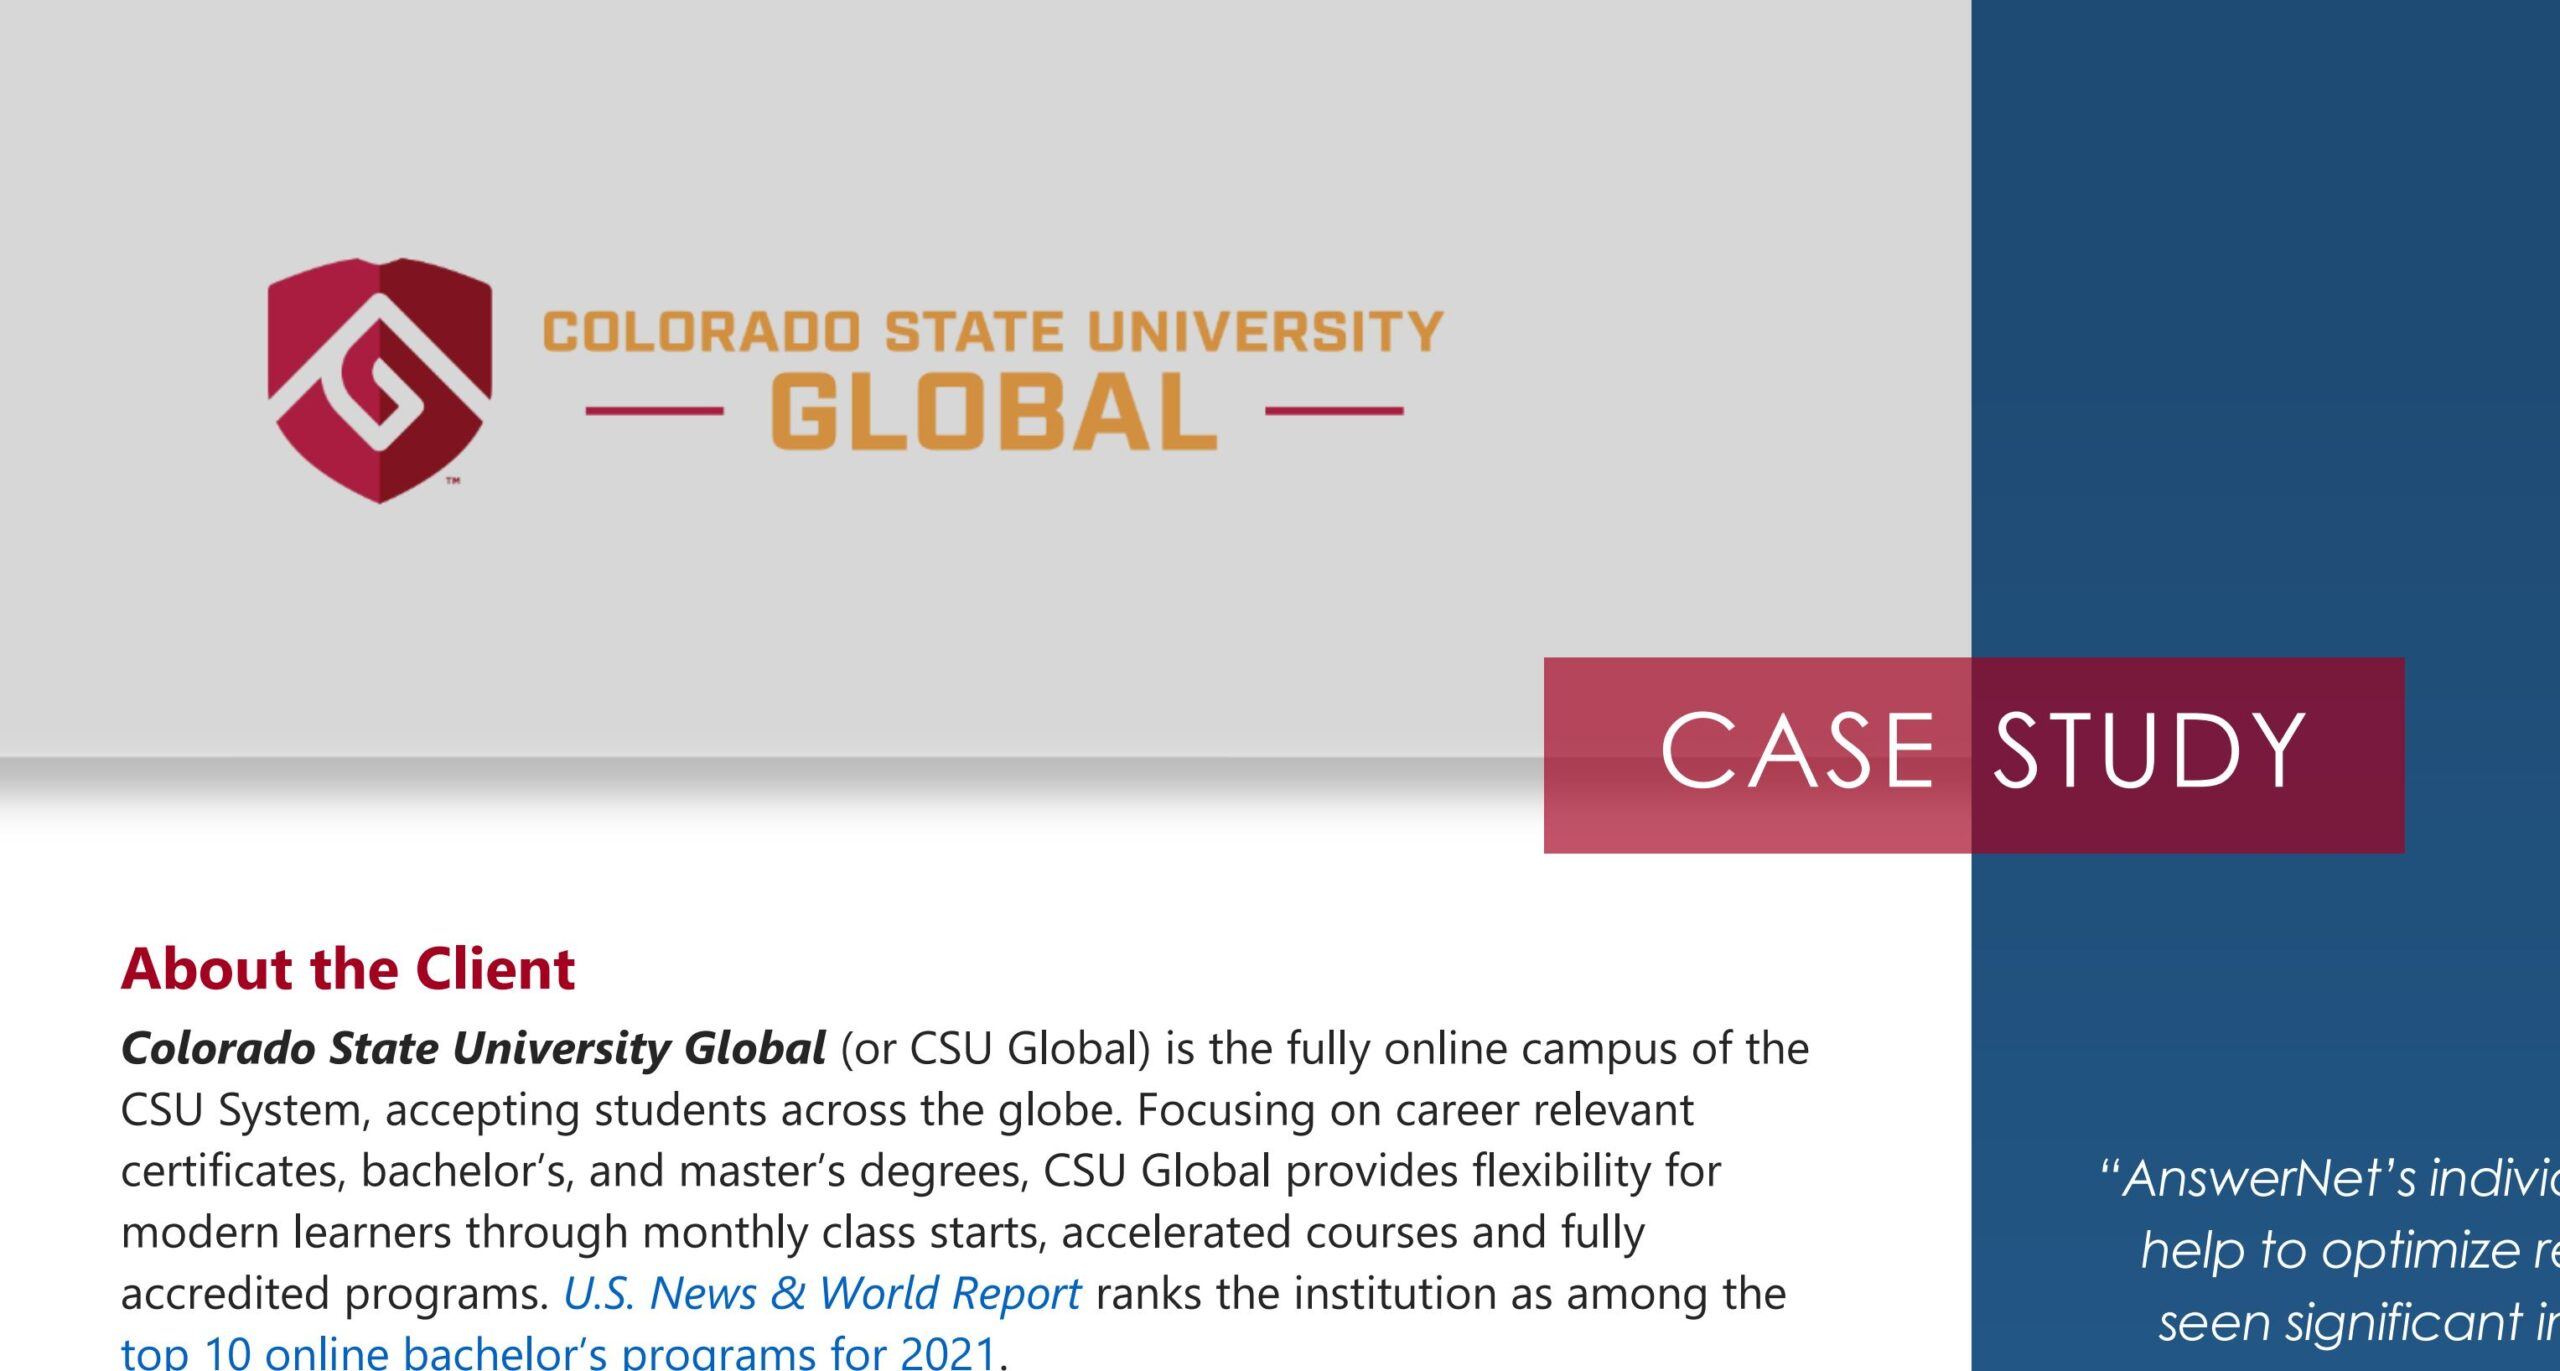 csu global case study cover